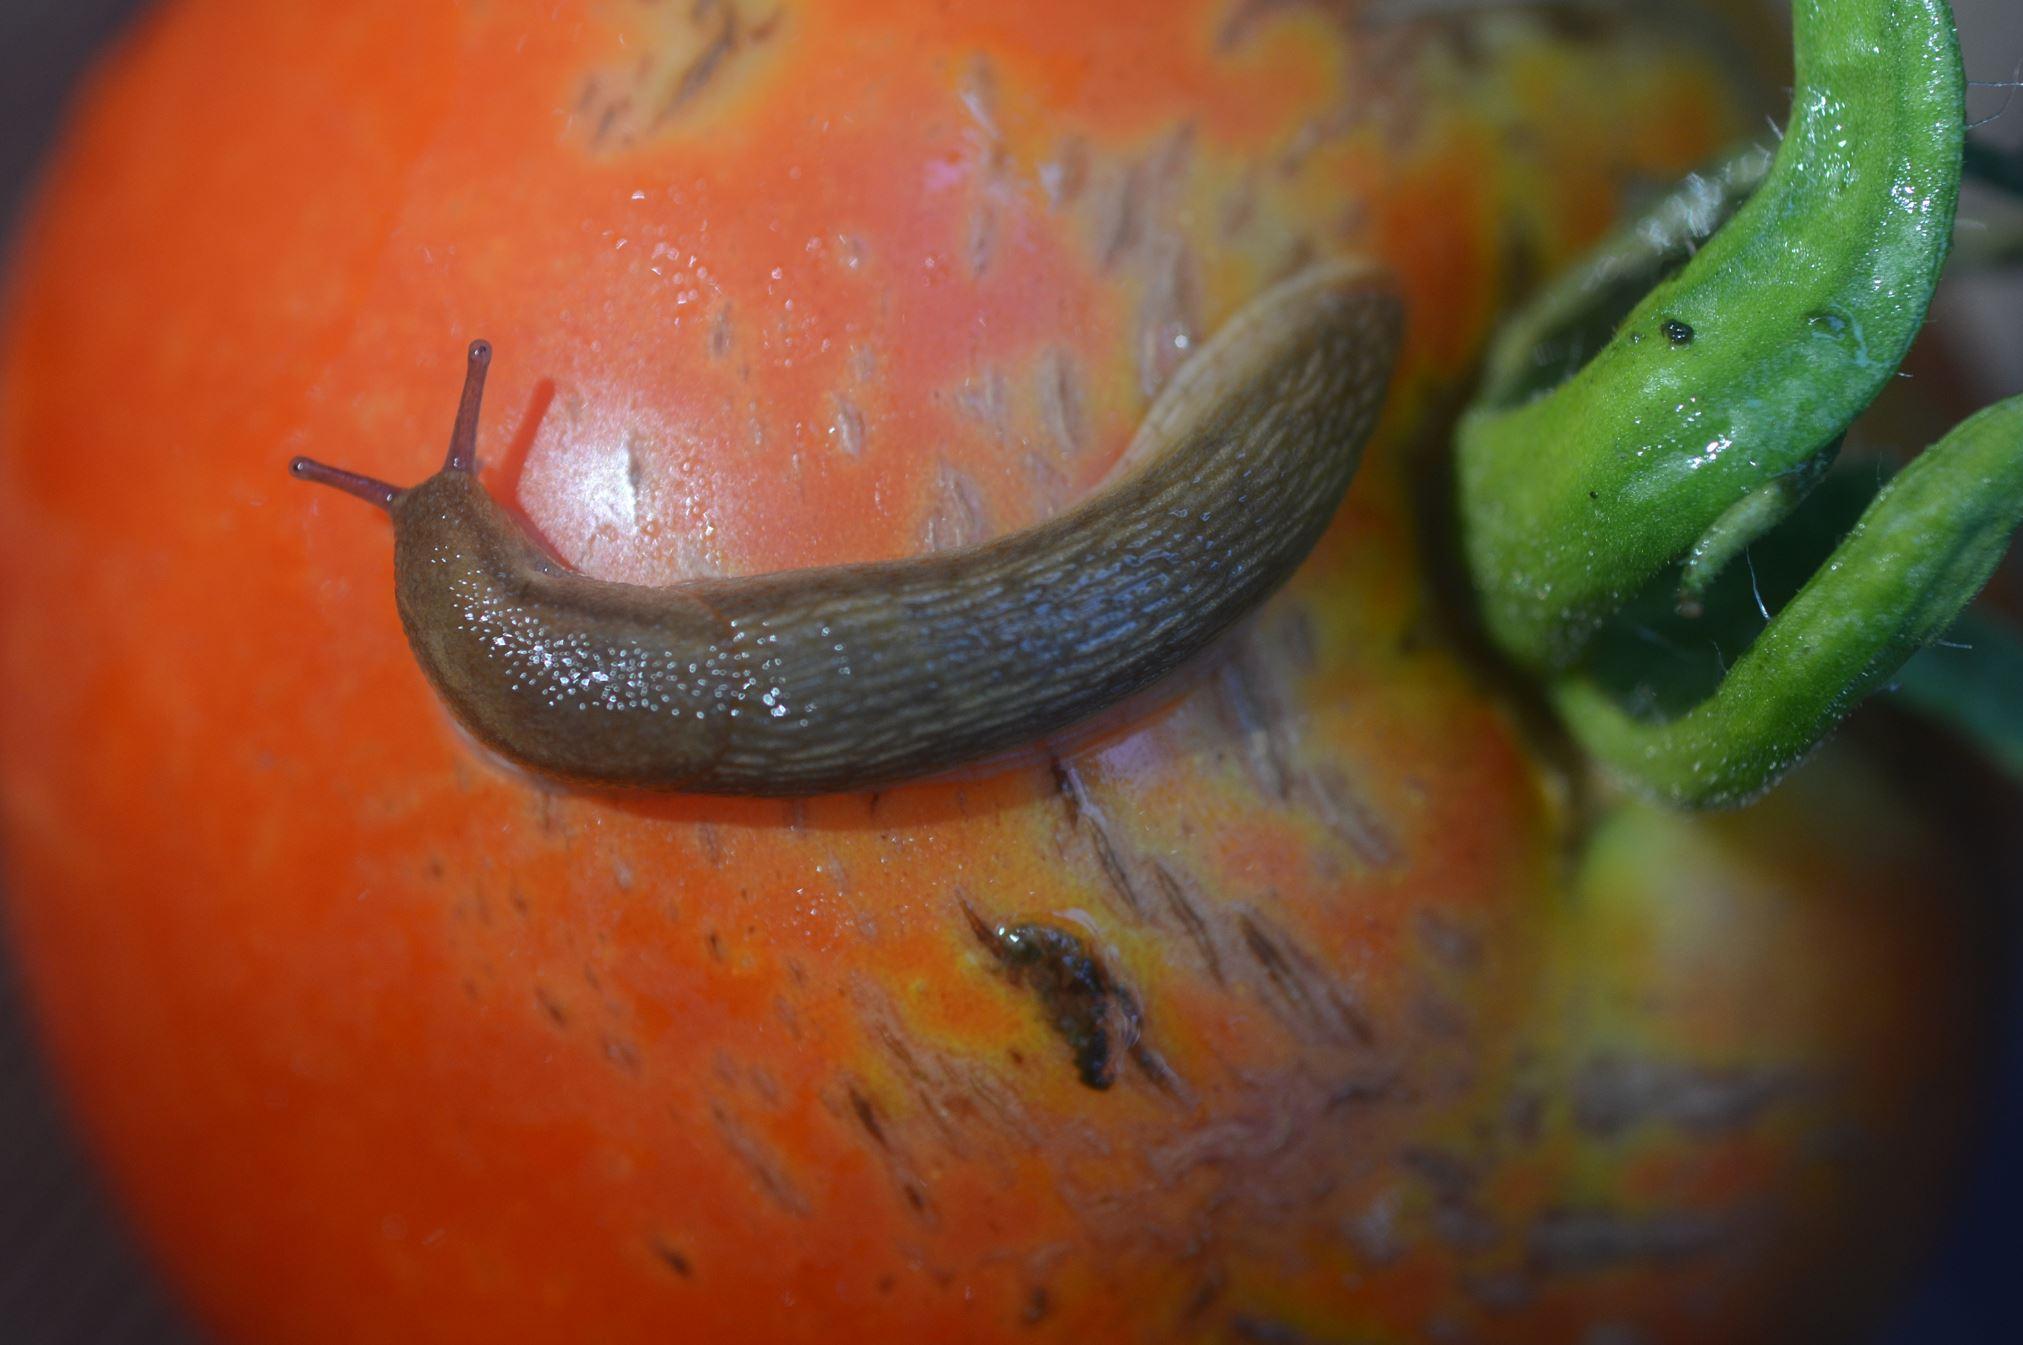 How To Keep Slugs Off Your Plants Pittsburgh Post Gazette